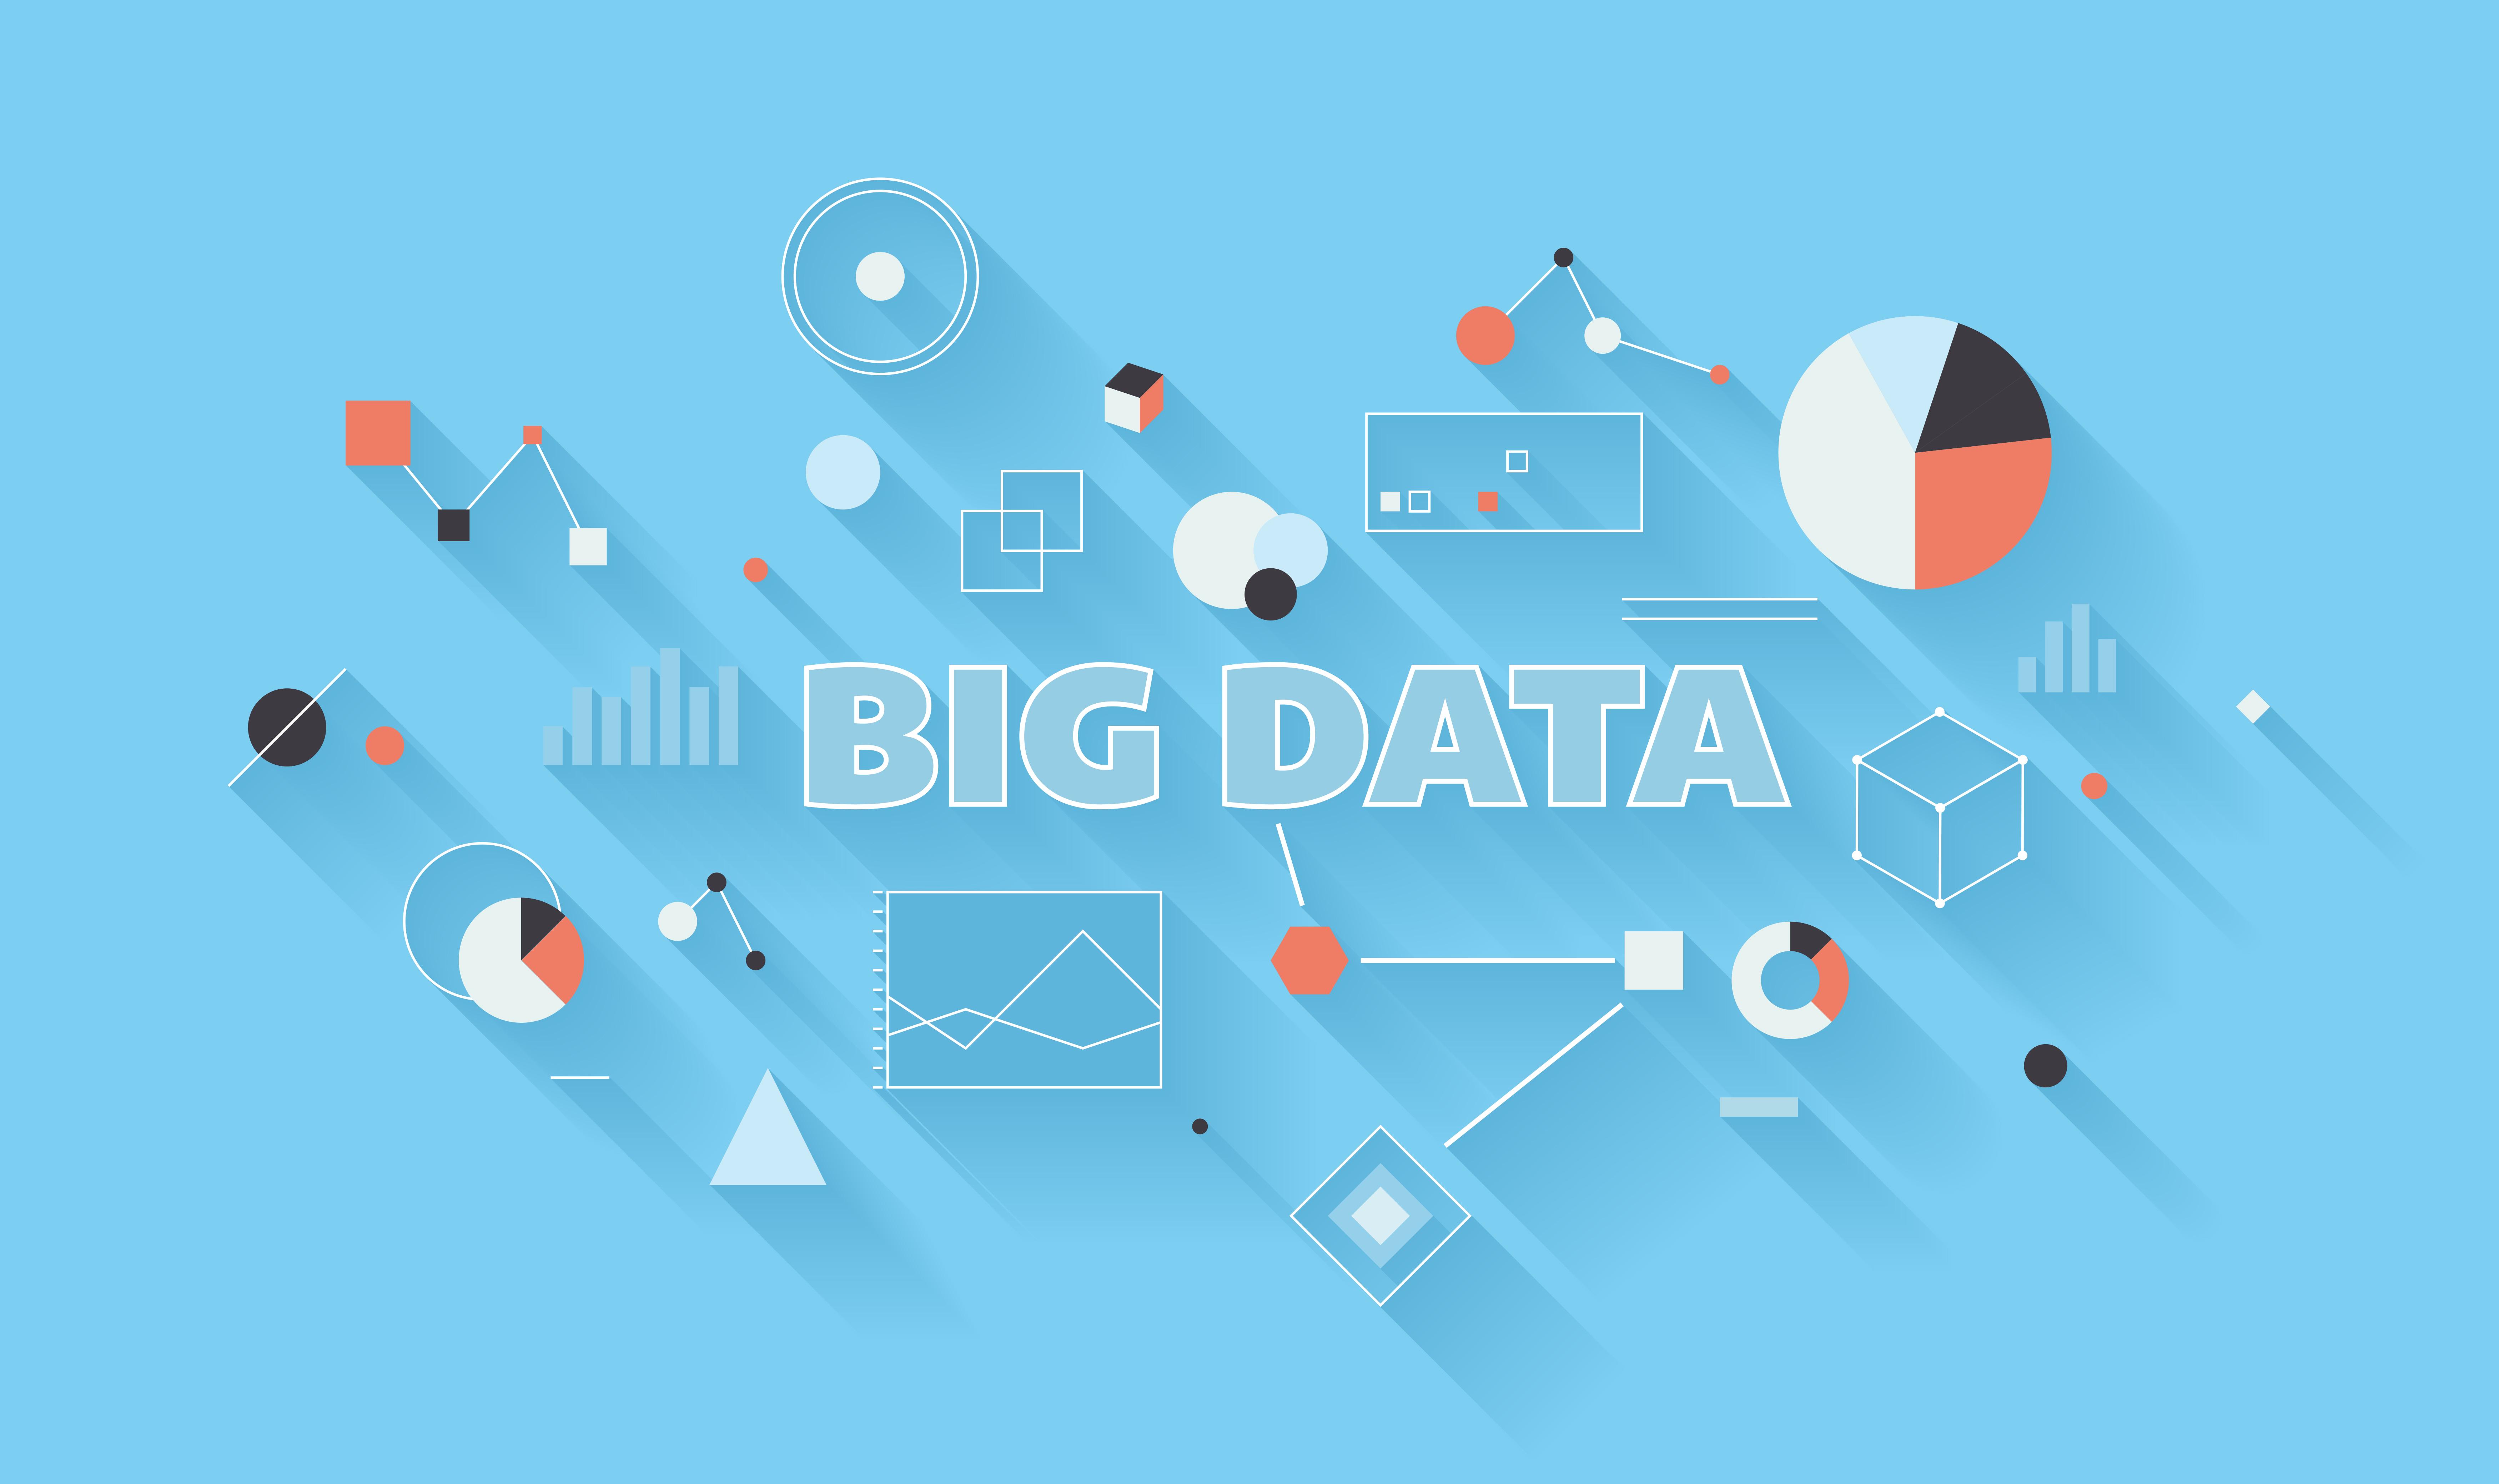 big-data-2014.jpg